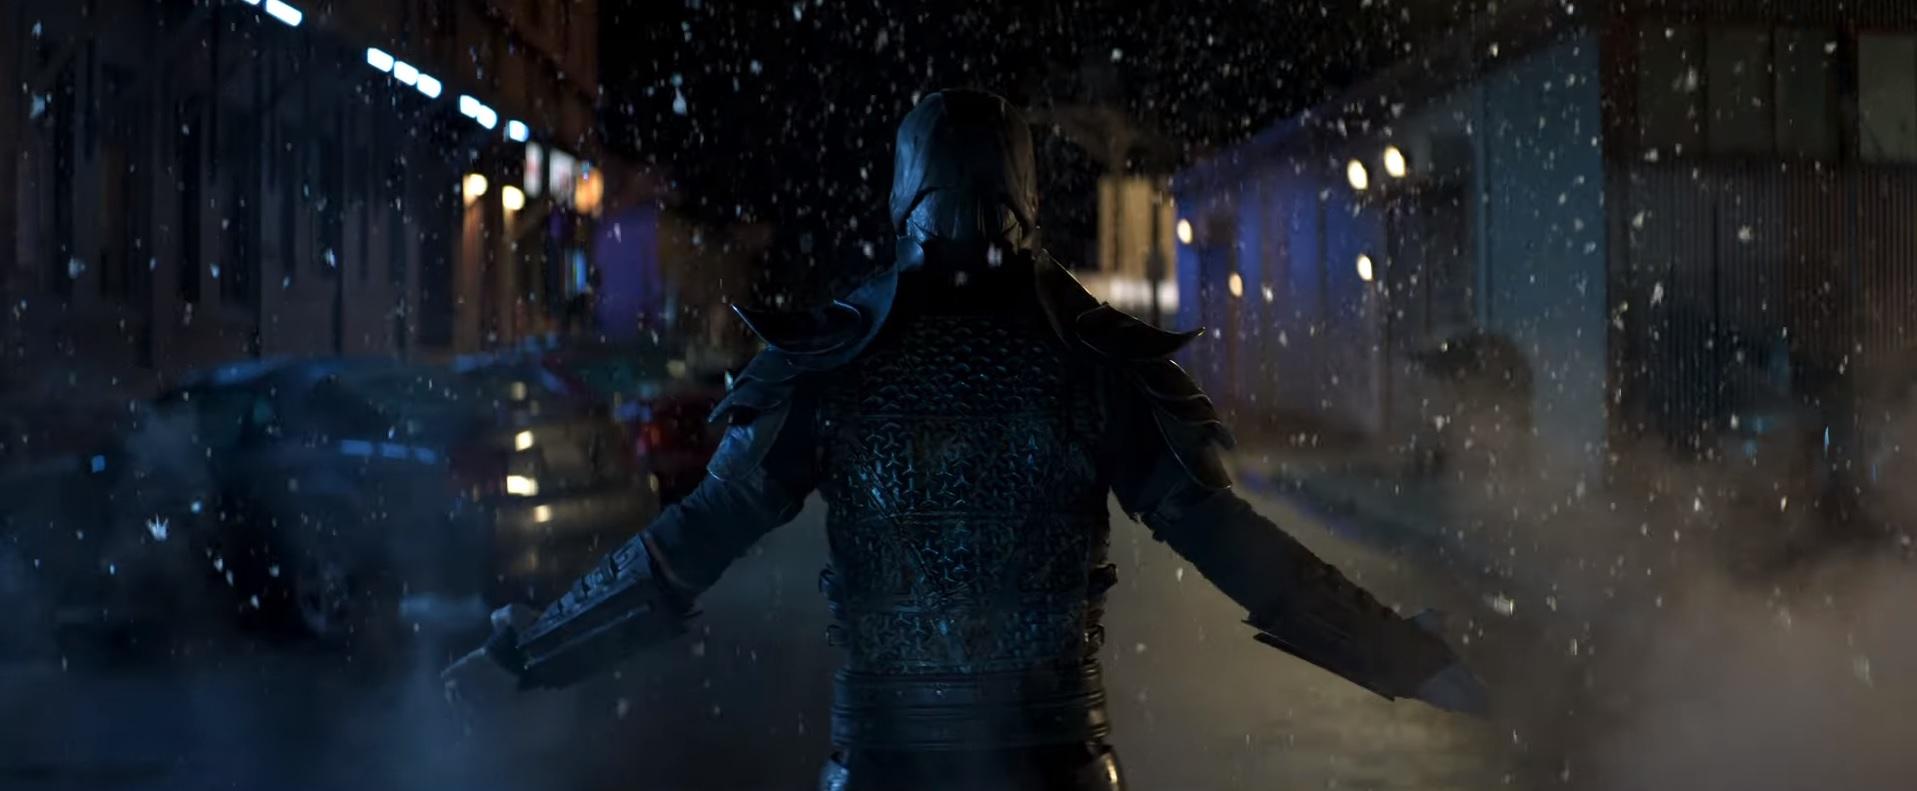 Mortal Kombat teaser